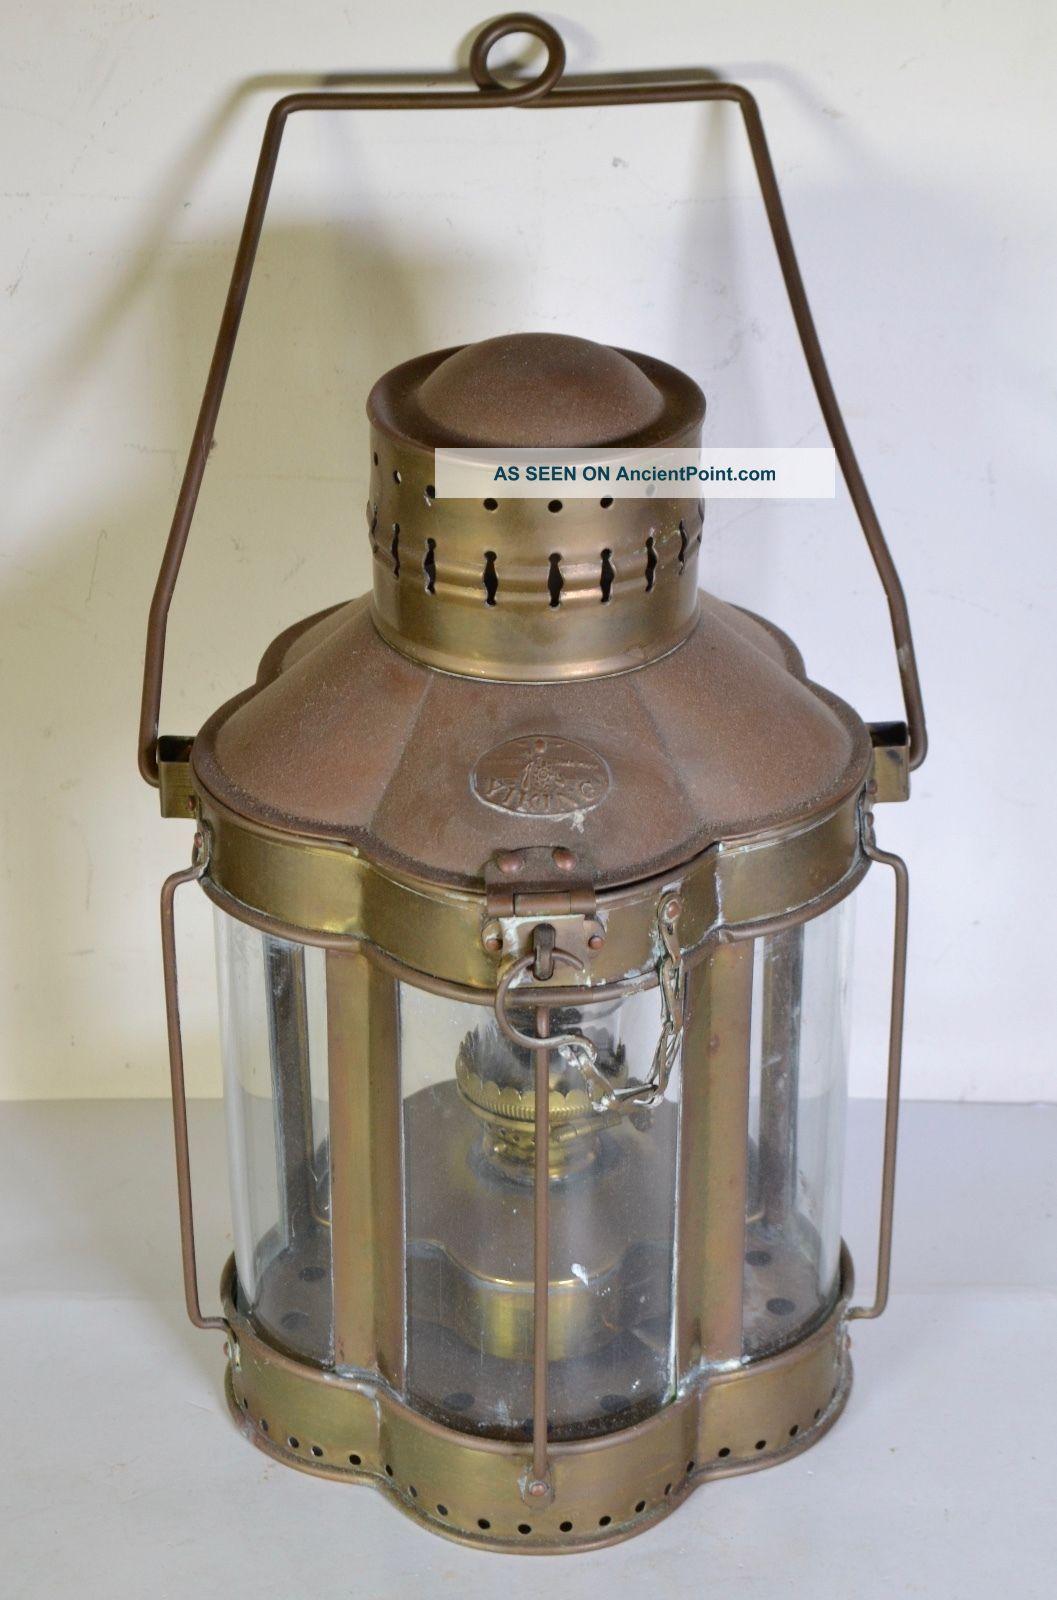 Antique Viking Brass Hanging Nautical Ship Oil Lantern - Rare Scalloped Design Lamps & Lighting photo